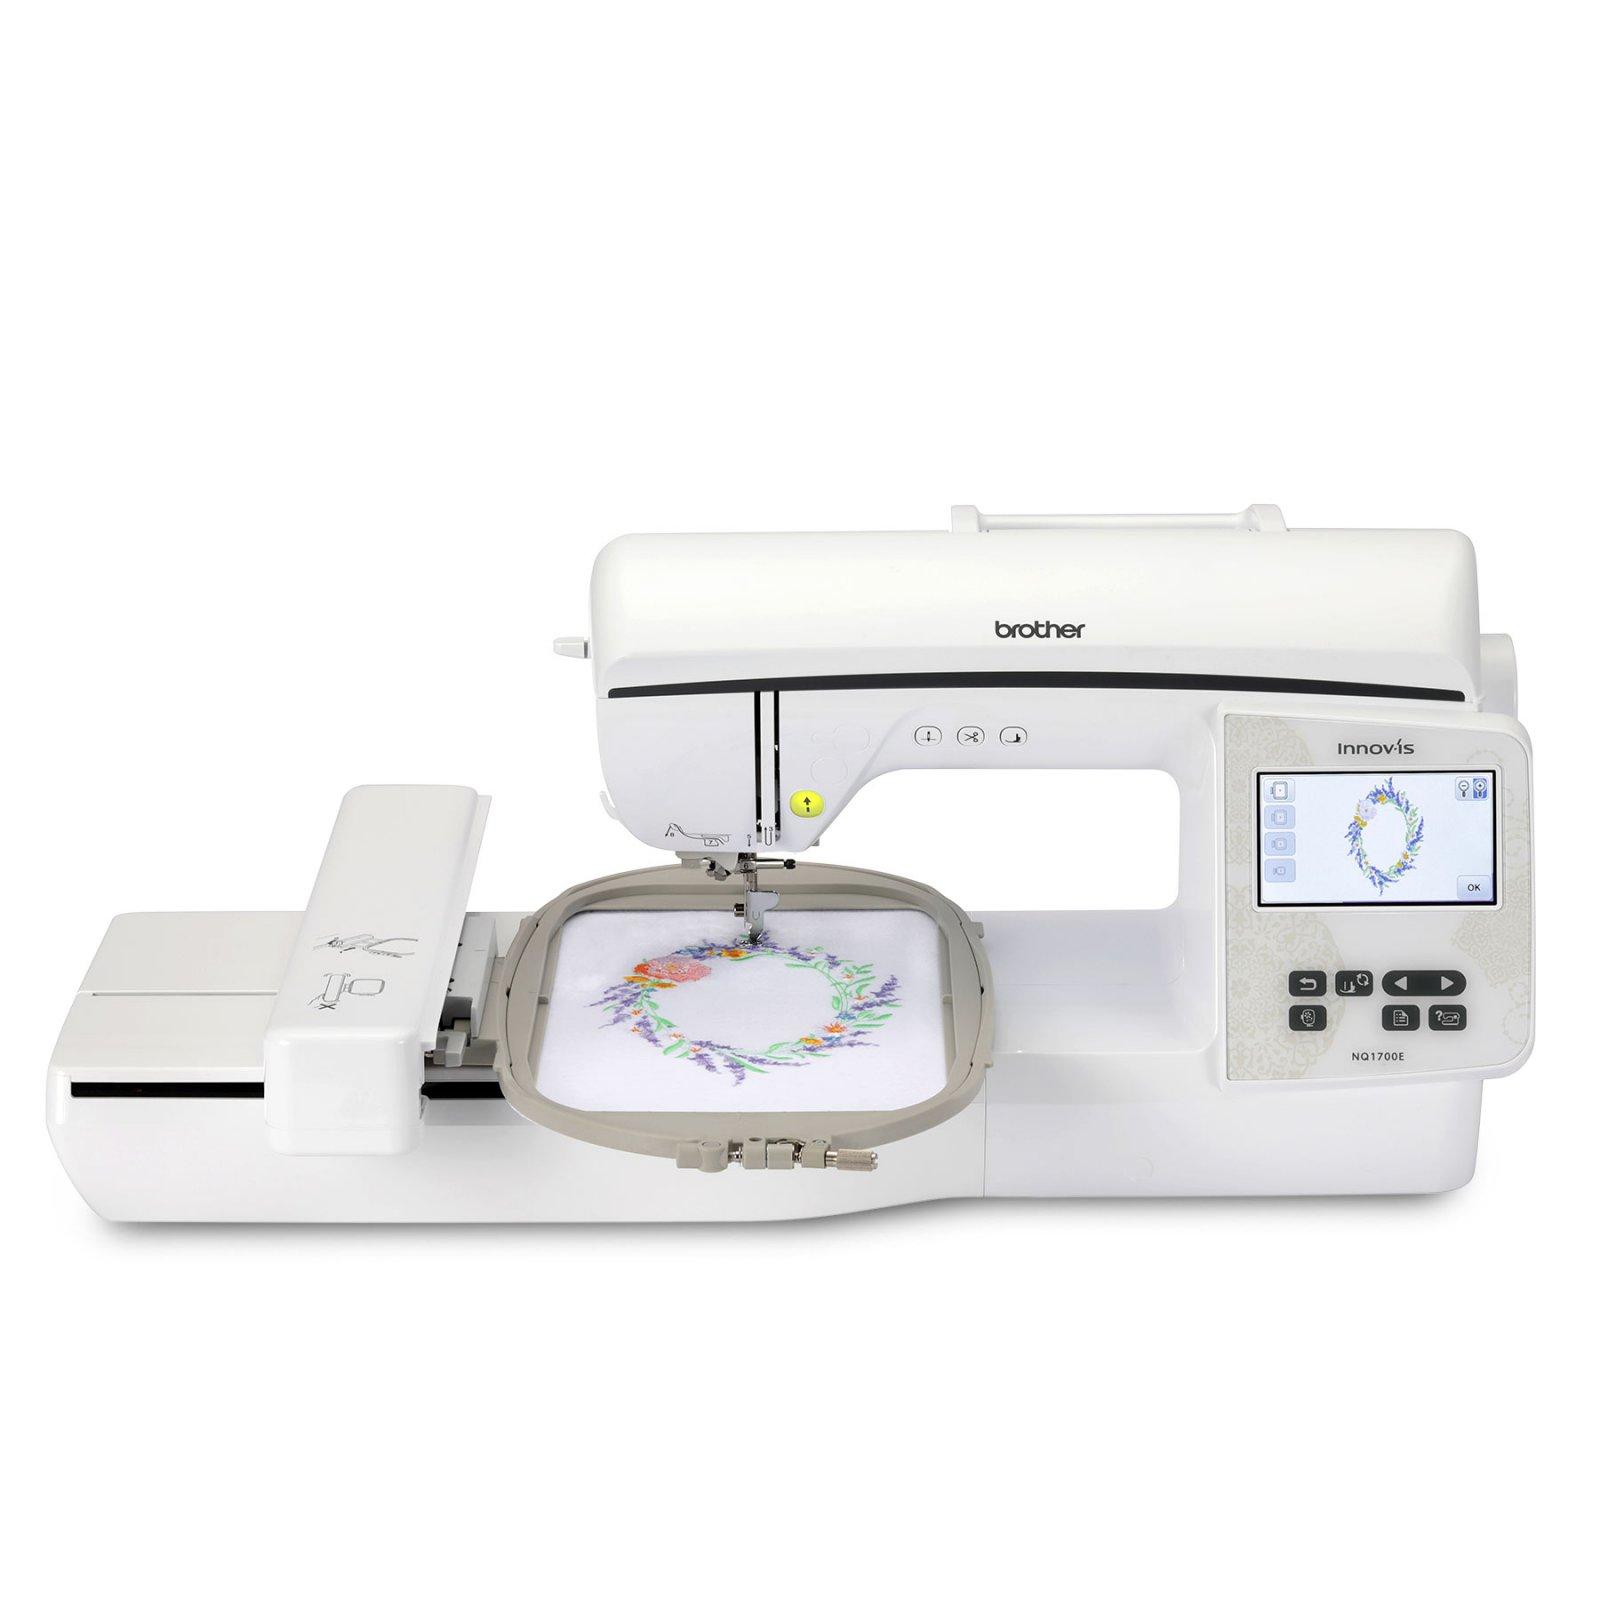 Brother NQ1700E The Fashion Creator 2 Embroidery Machine - NEW!